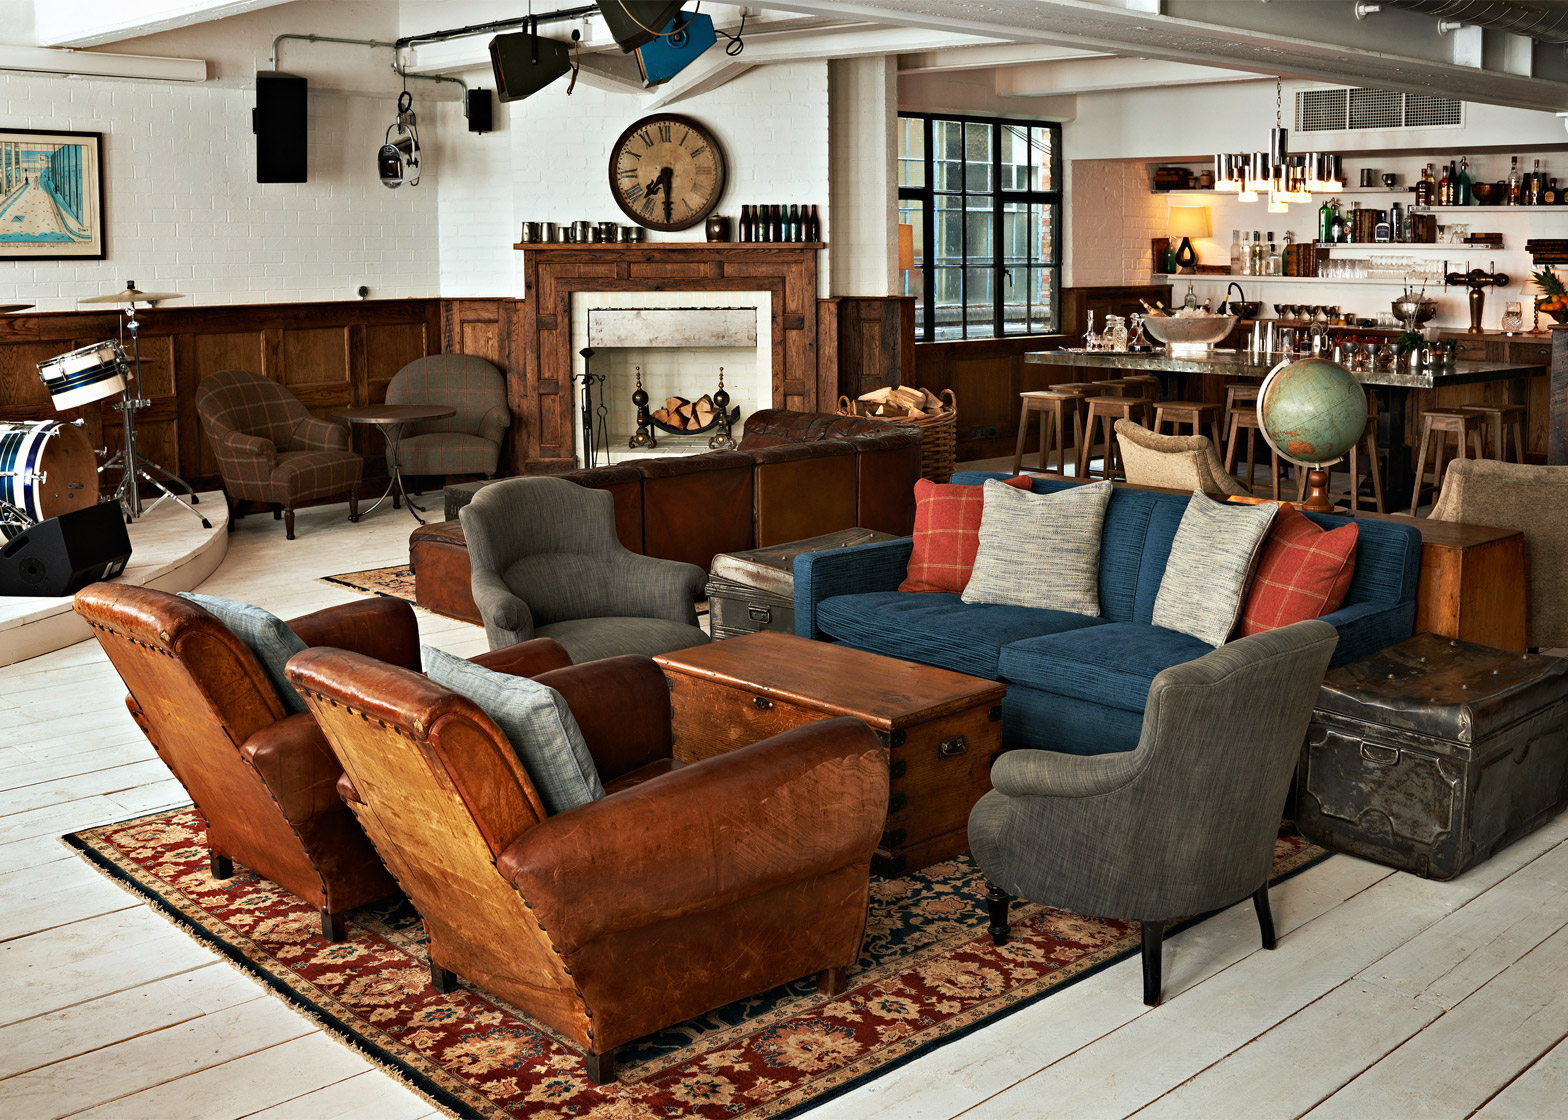 shoreditch-house-soho-beach-house-miami-nick-jones-soho-house-interview-slideshow_dezeen_1568_3.jpg